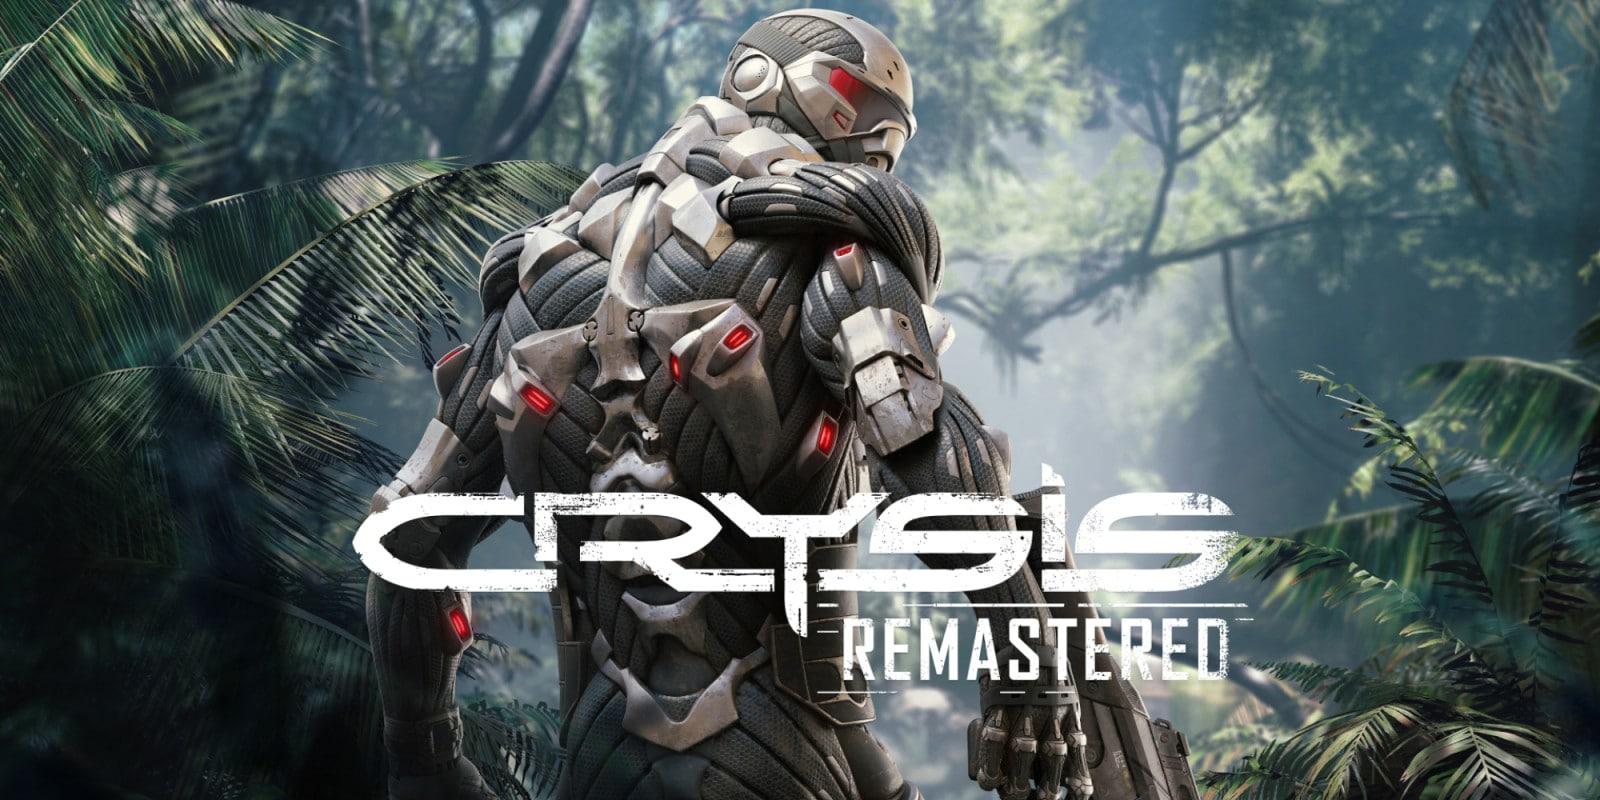 Crysis Remastered chega à Steam a 17 de Setembro